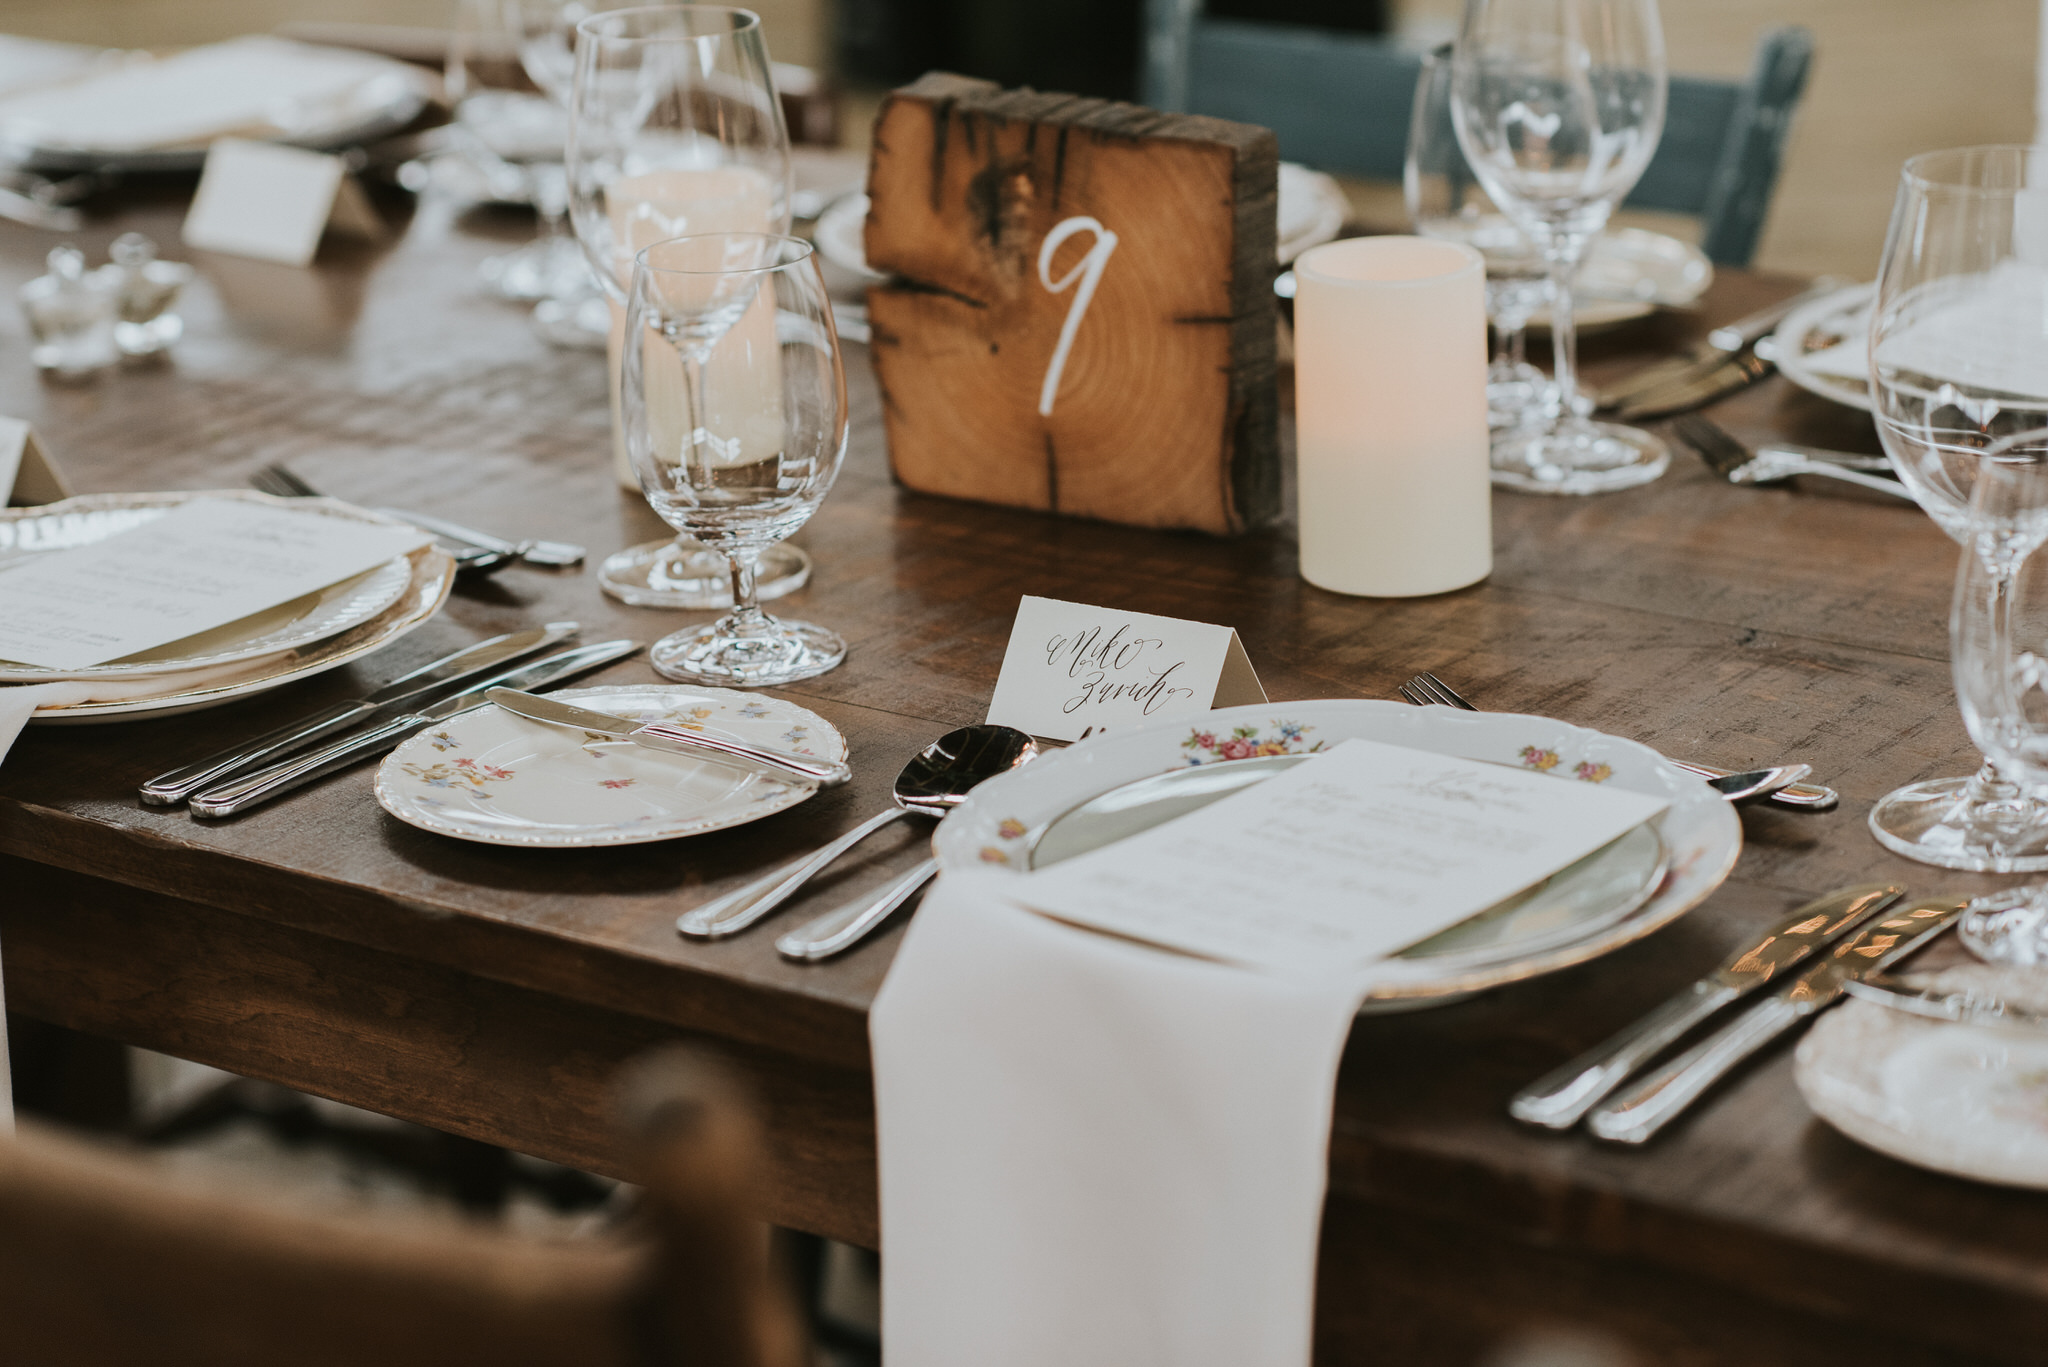 scarletoneillphotography_weddingphotography_prince edward county weddings091.JPG